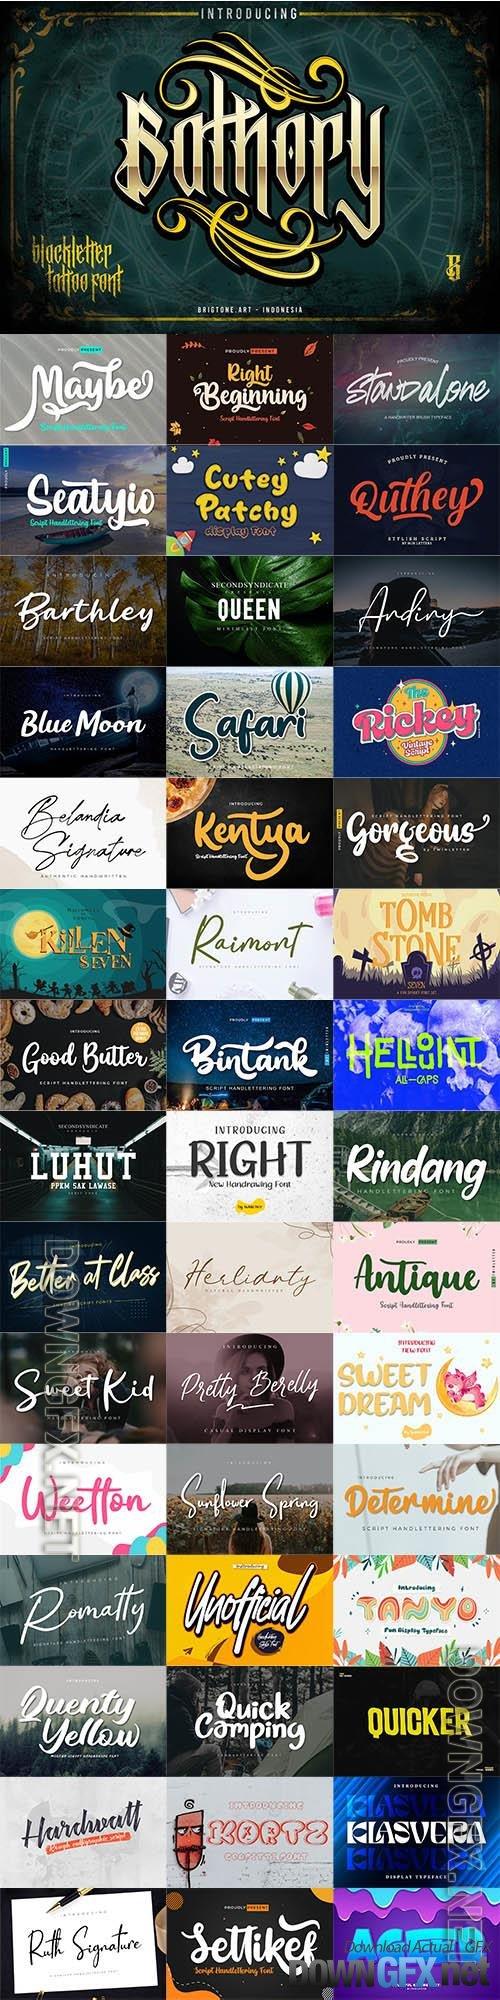 48 Awesome Fonts Bundle 14 (OTF, TTF, WOFF)